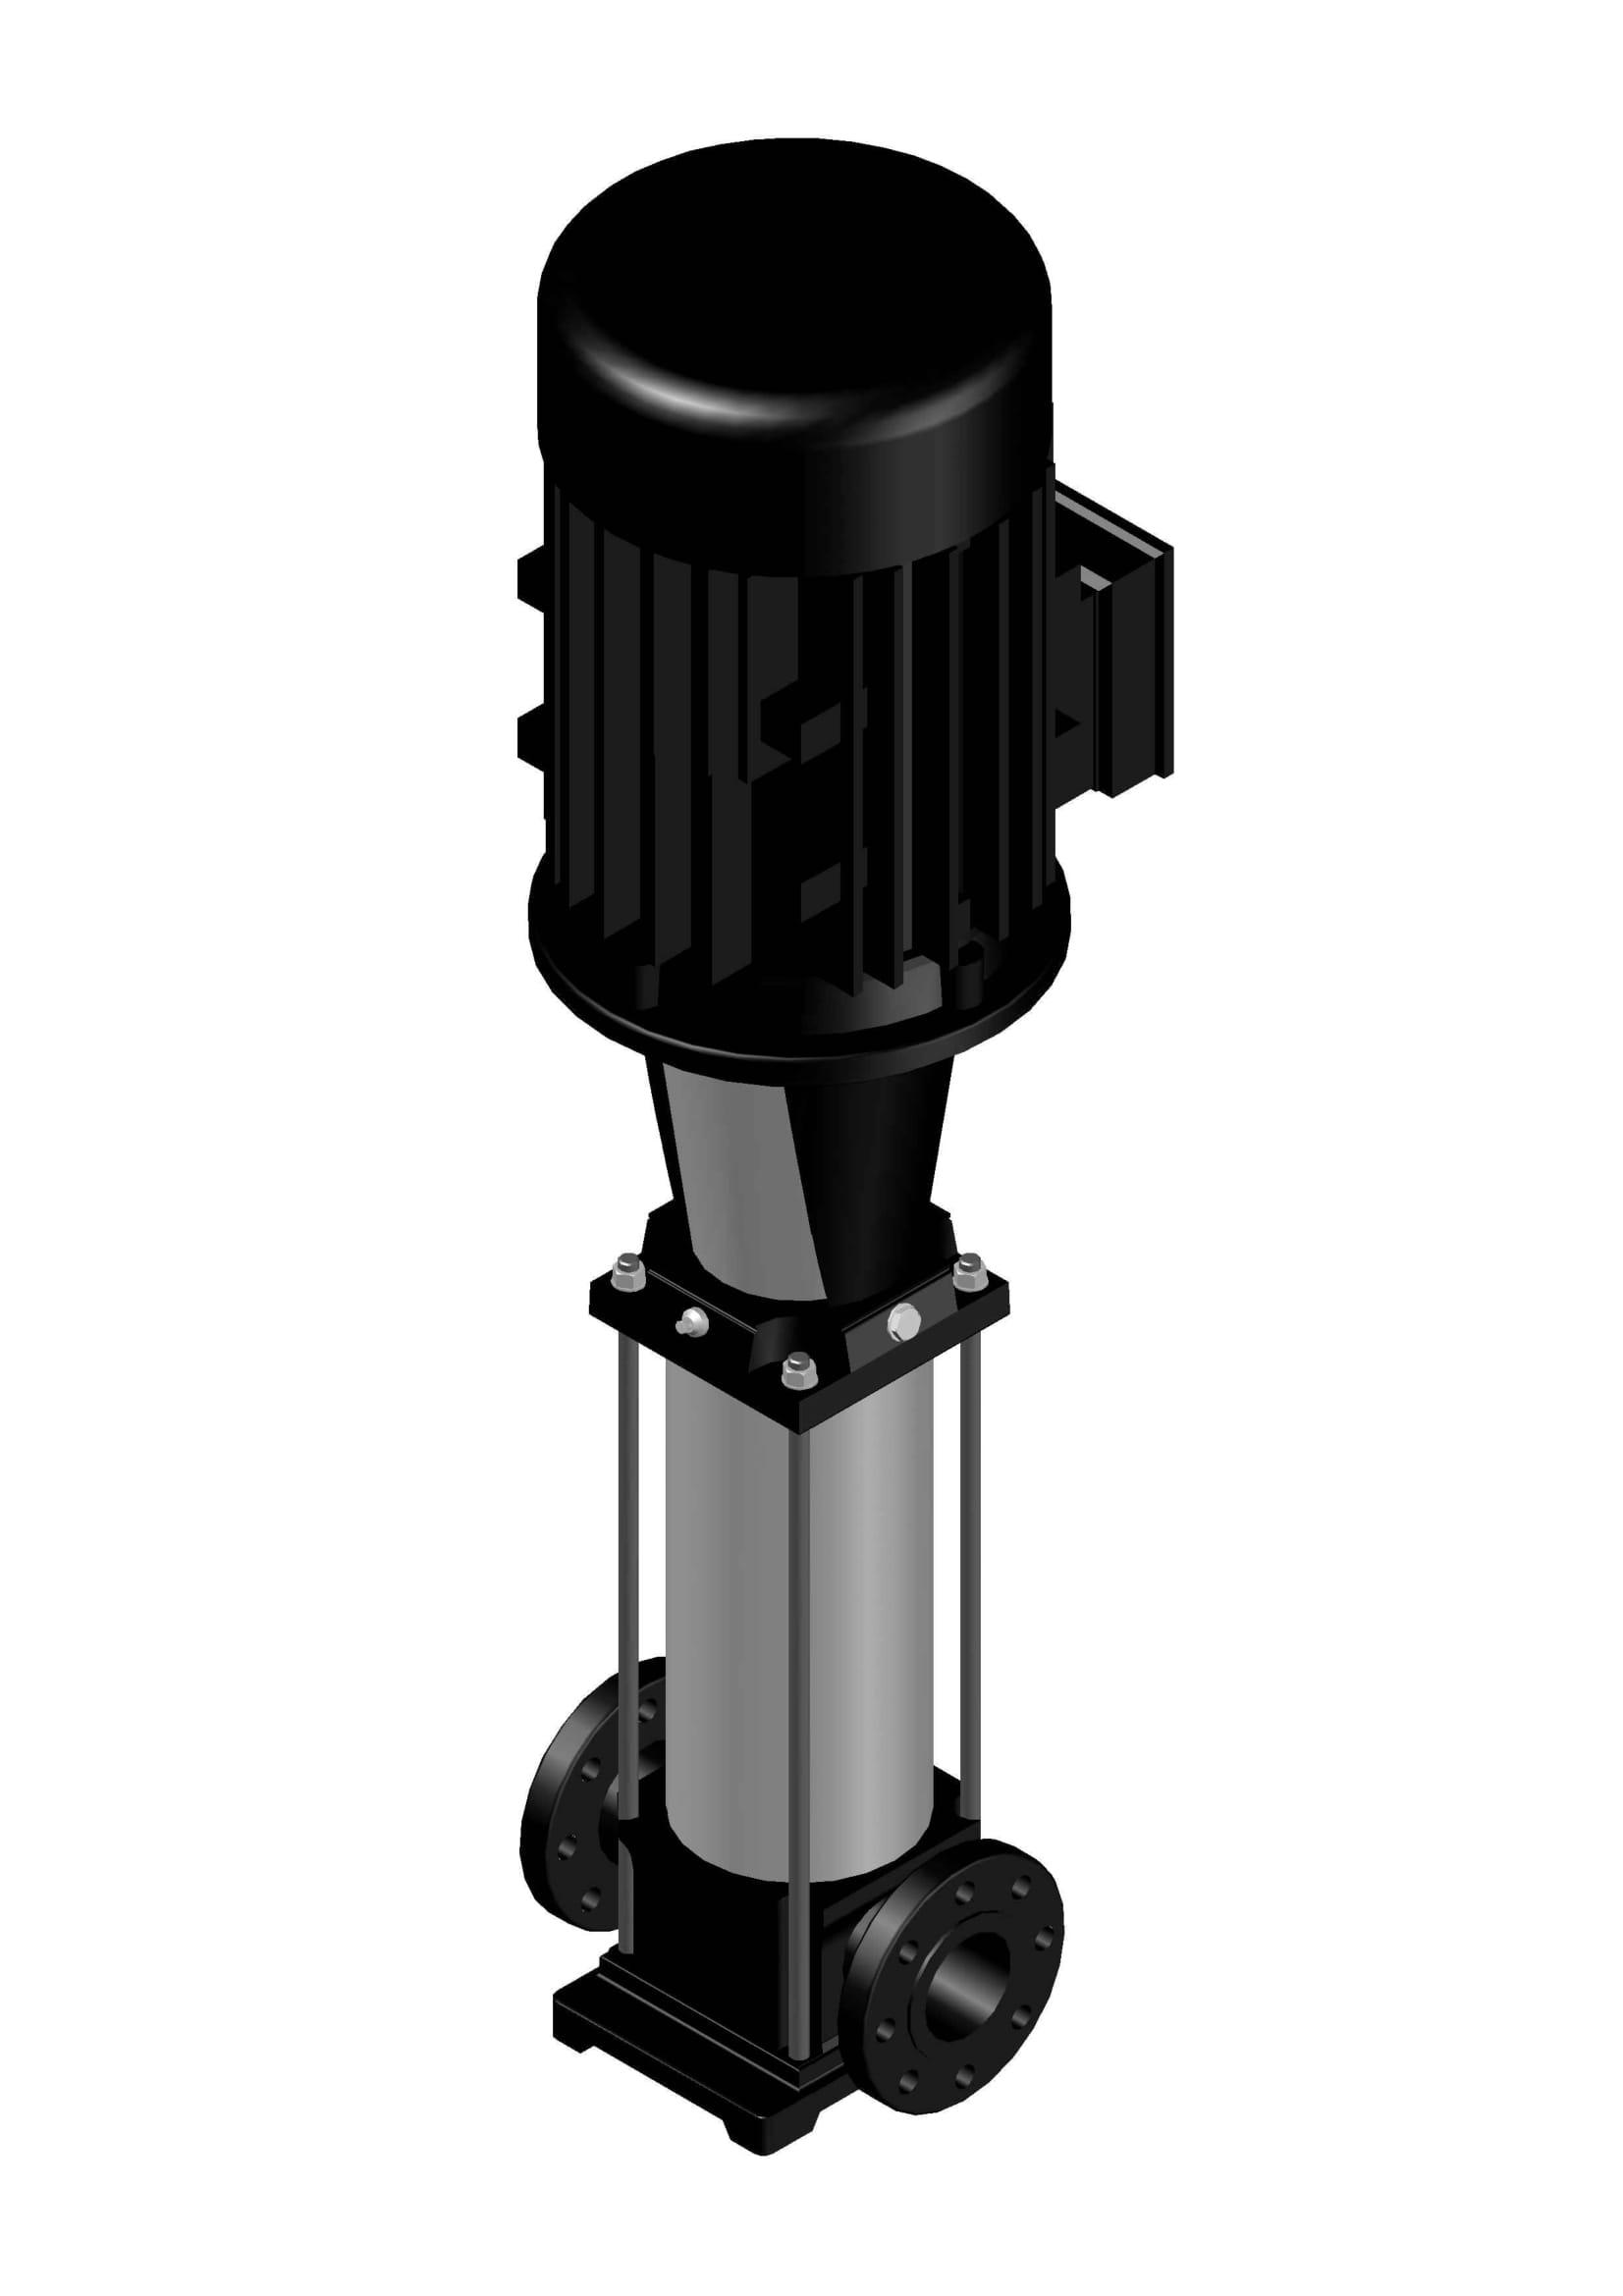 BV 64-06-02